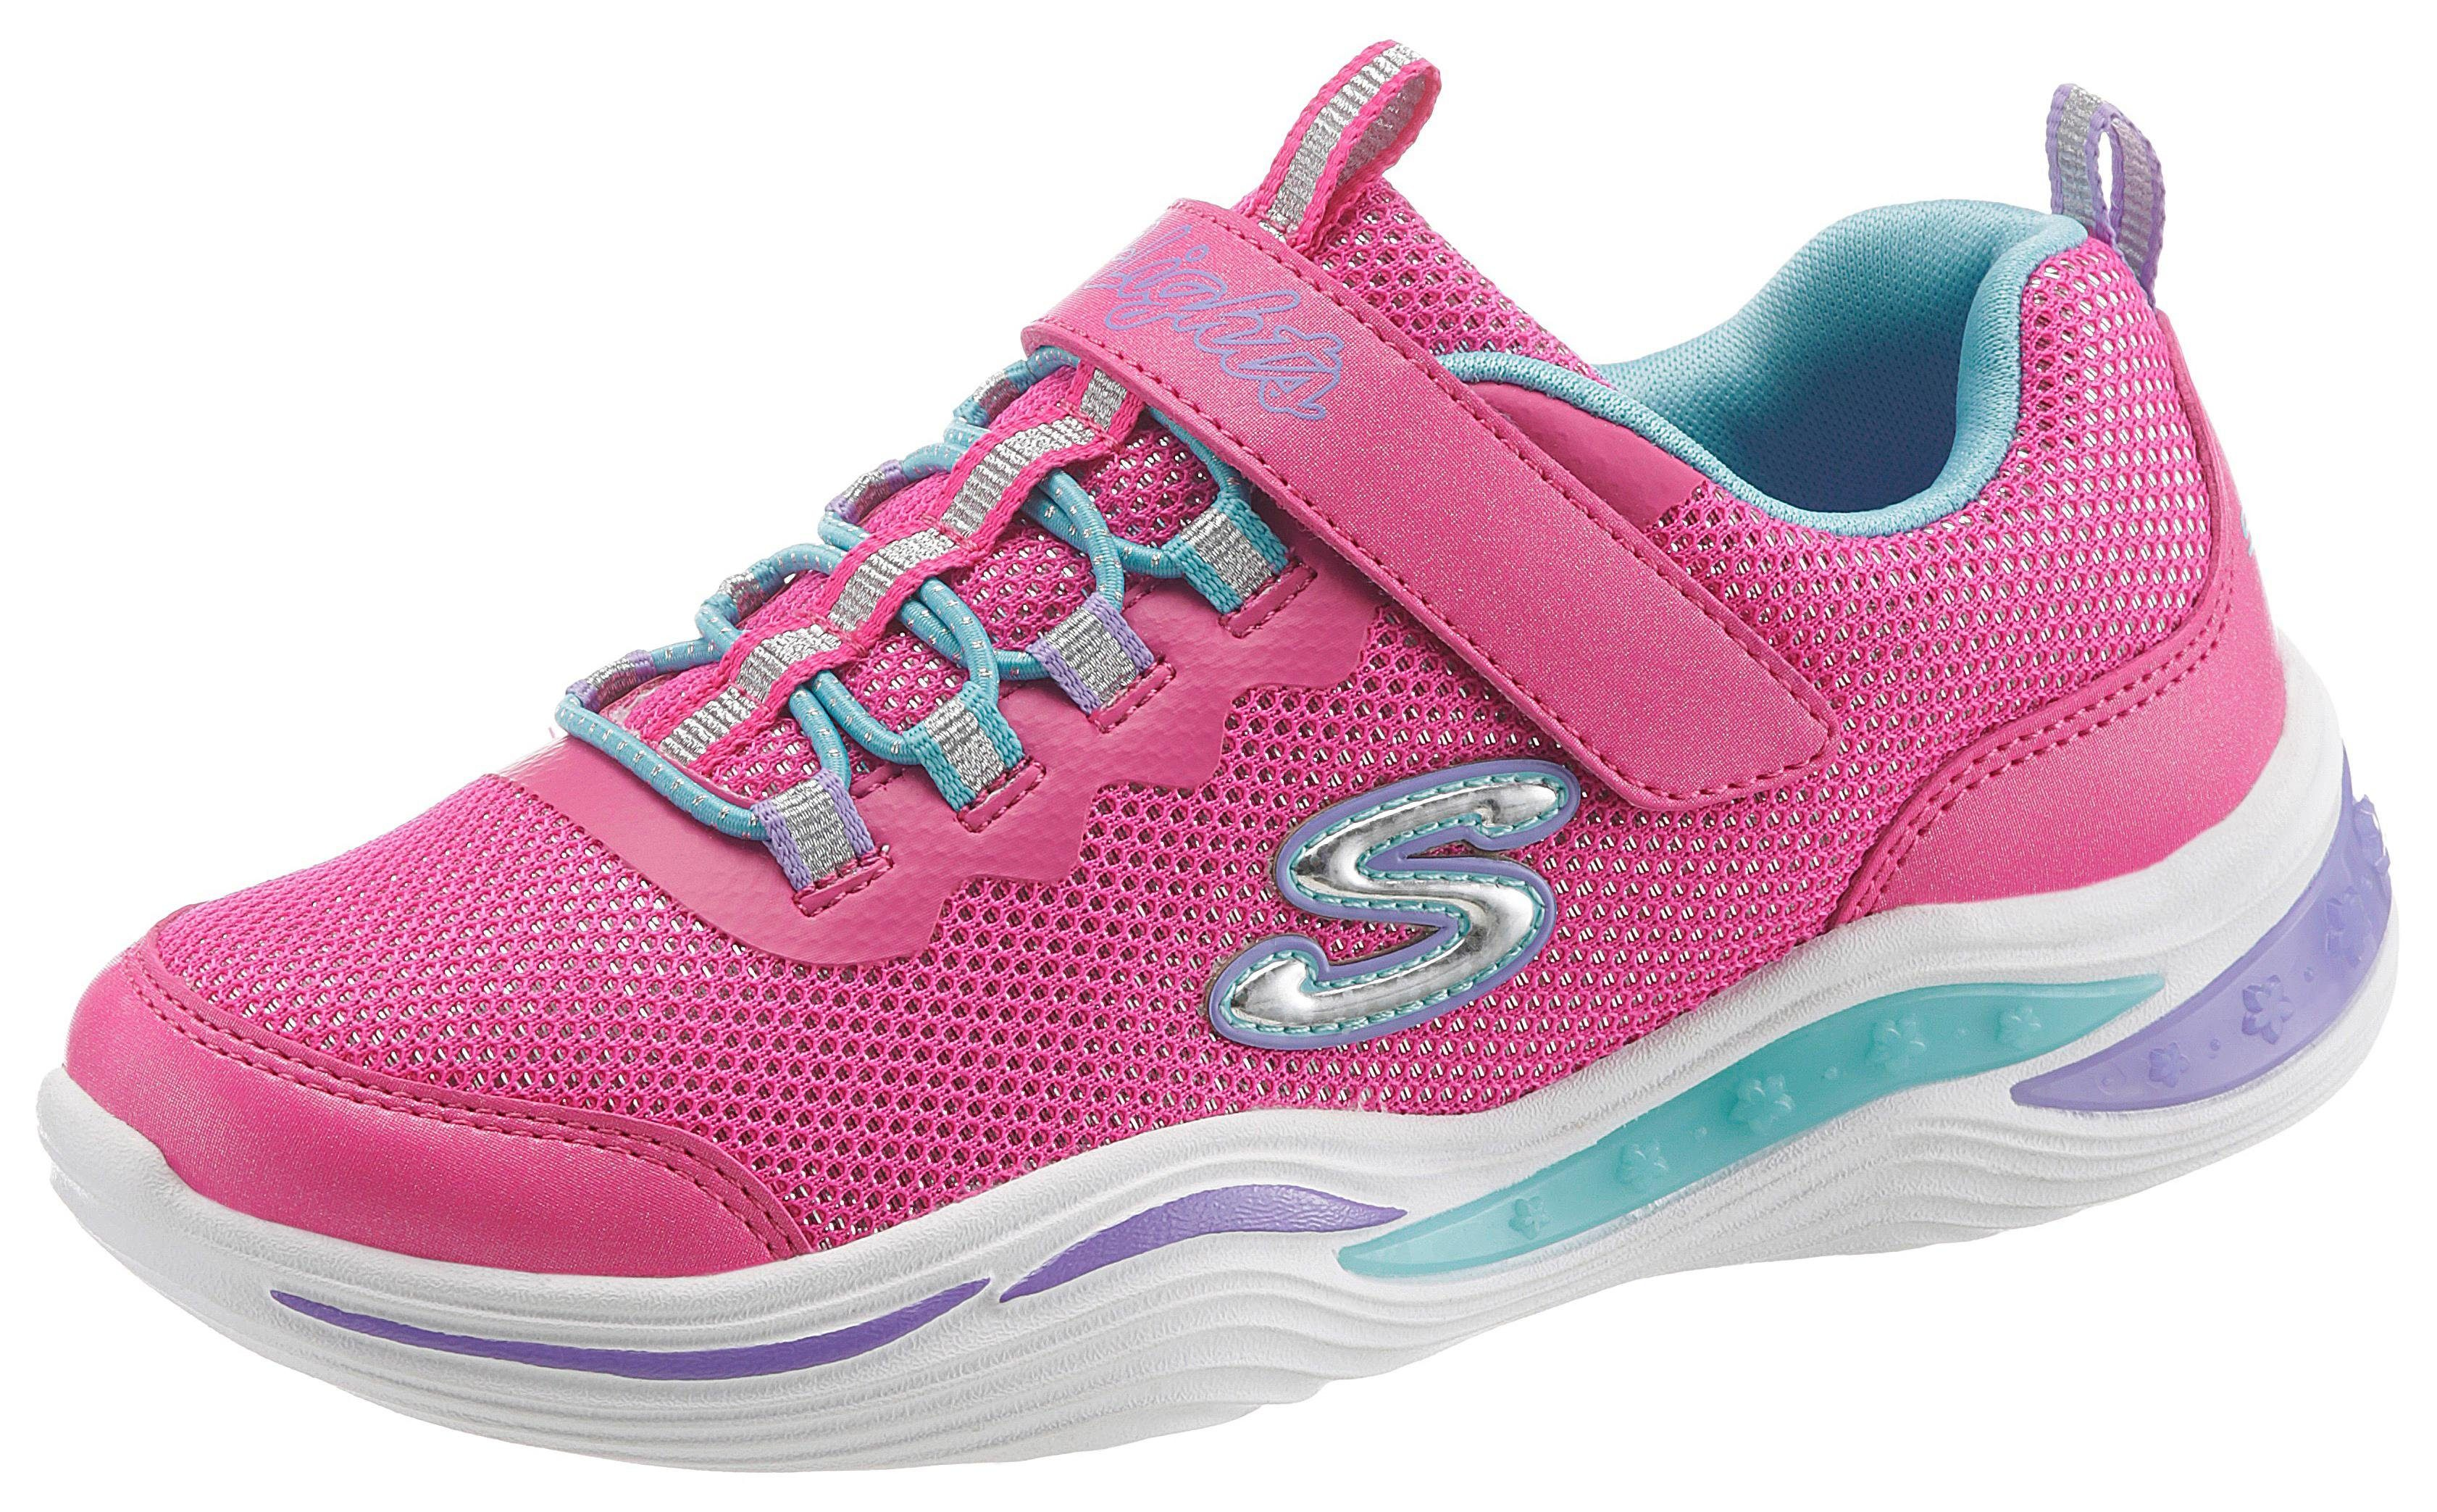 Skechers Kids »Blinkschuh Power Petals« Sneaker mit Glitzer